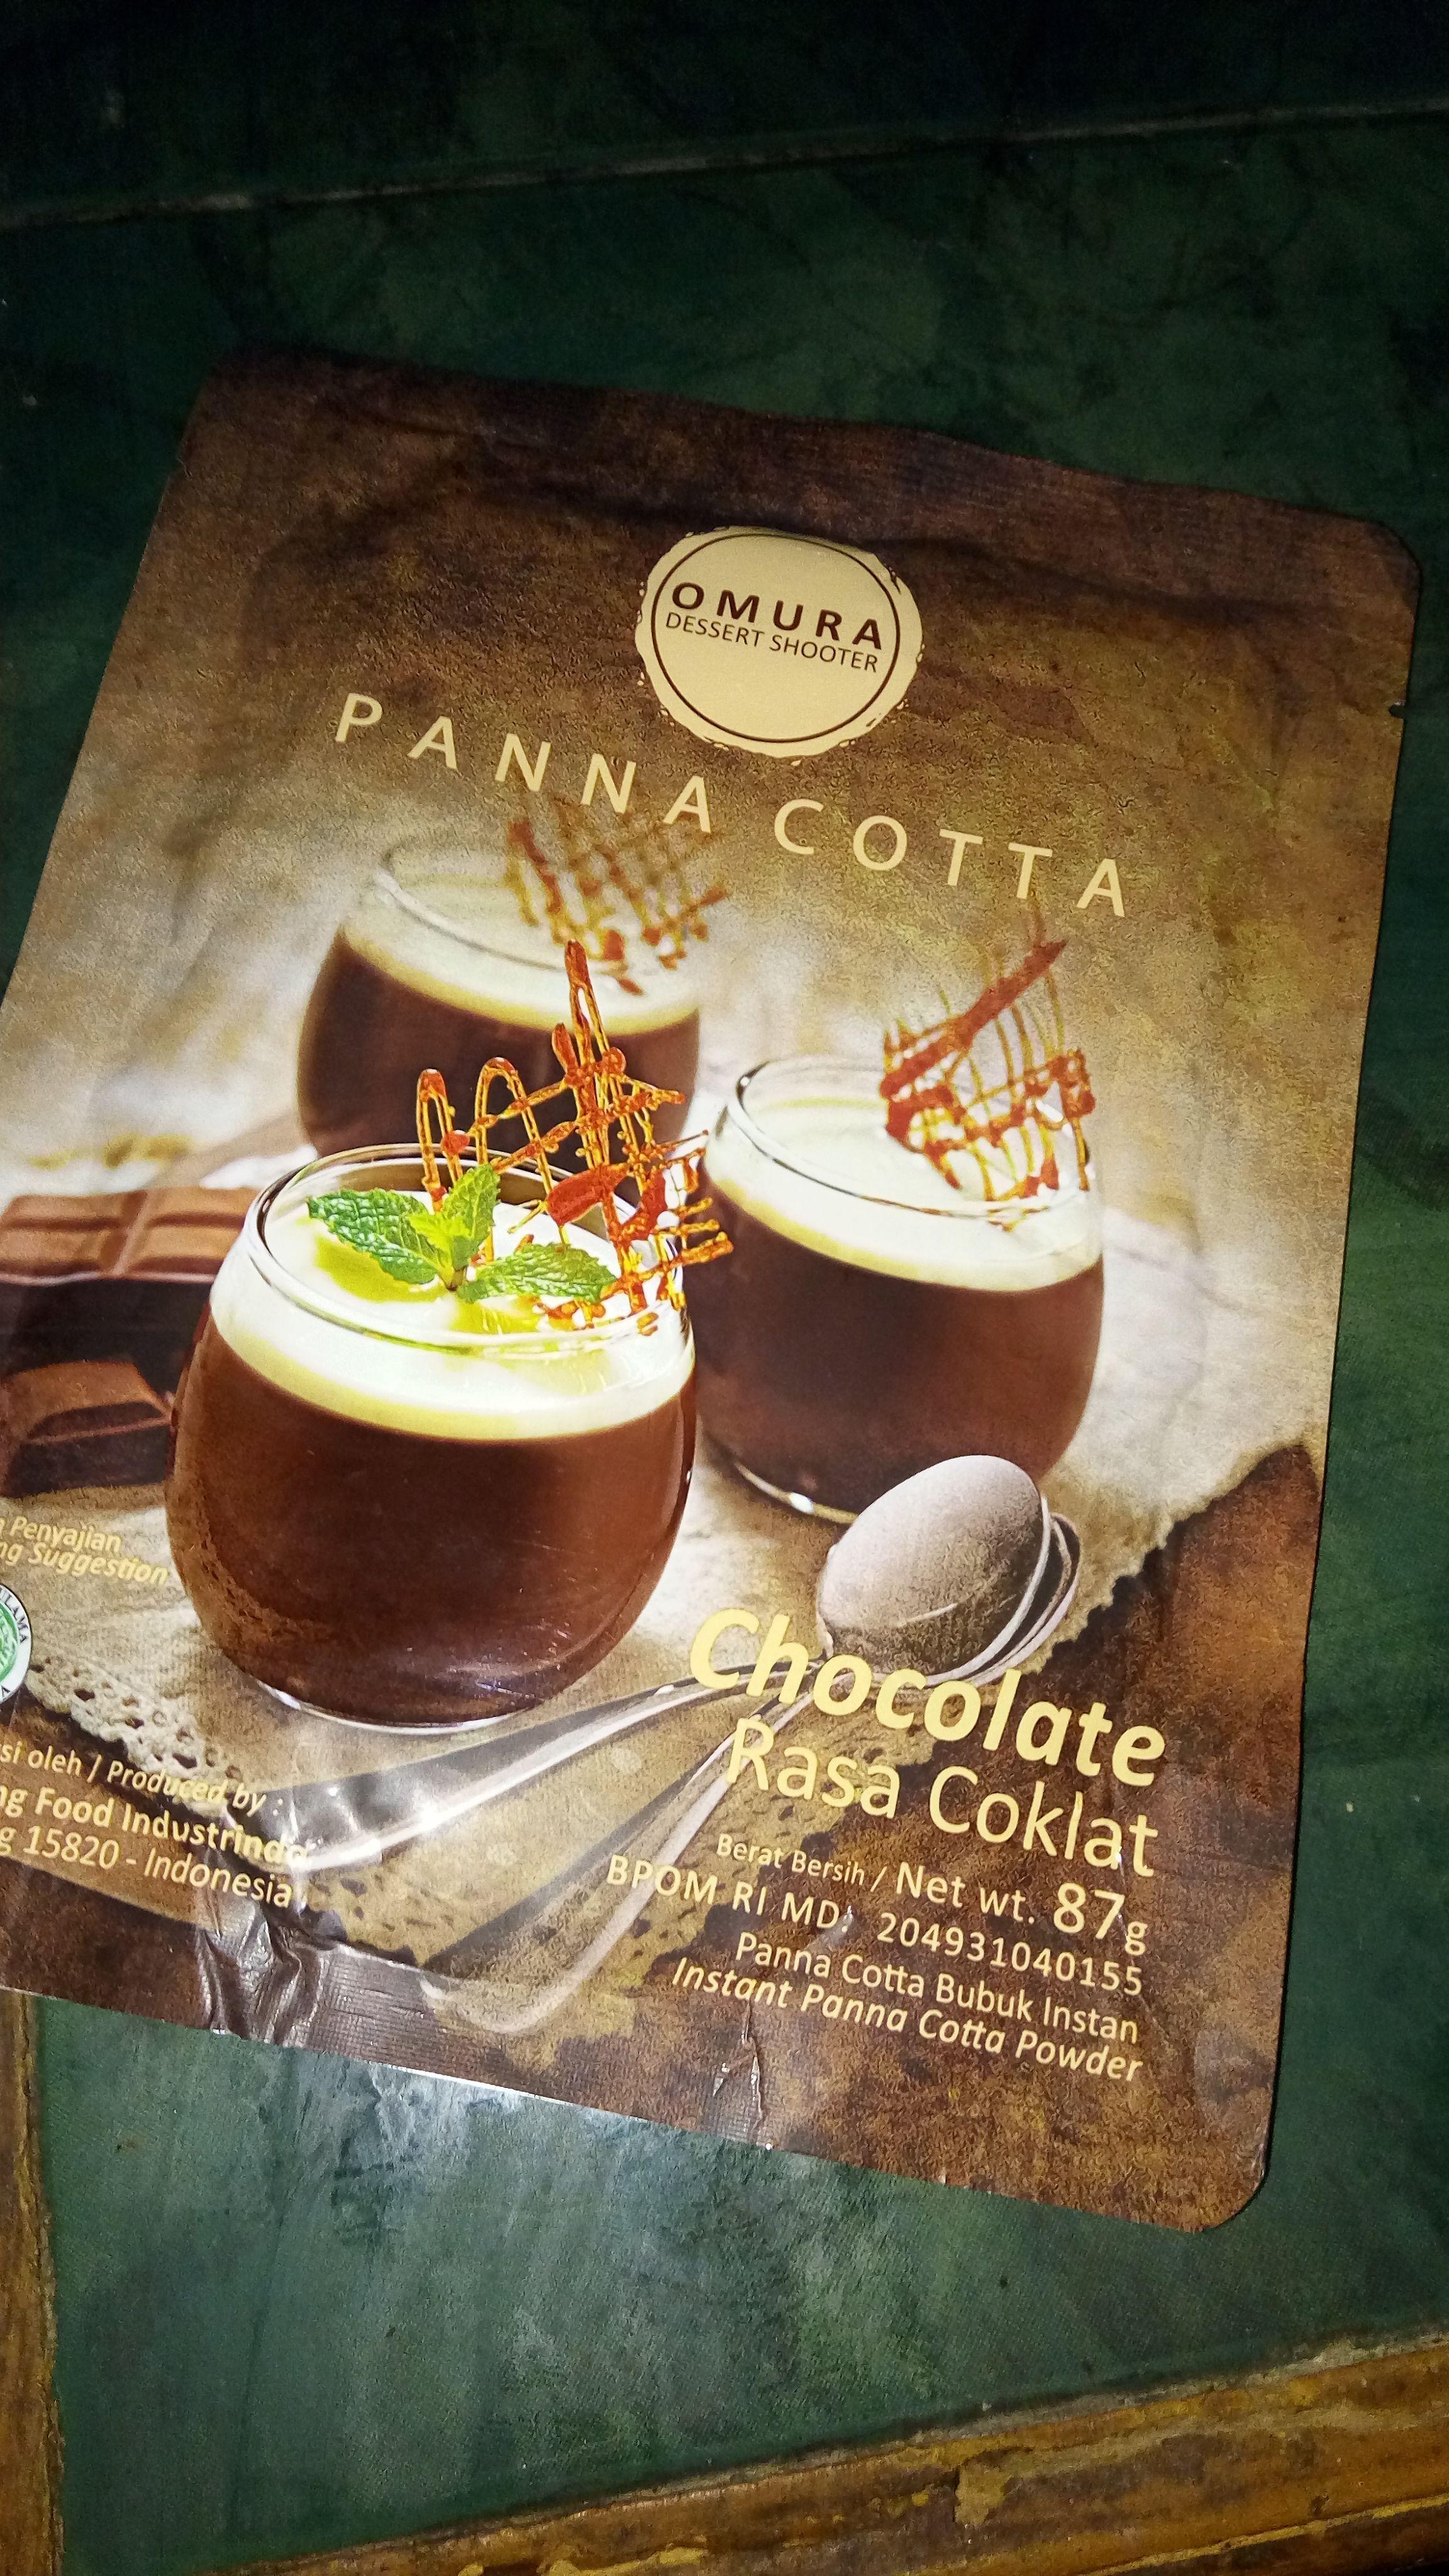 image review Omura Panna Cotta - Rasa Coklat